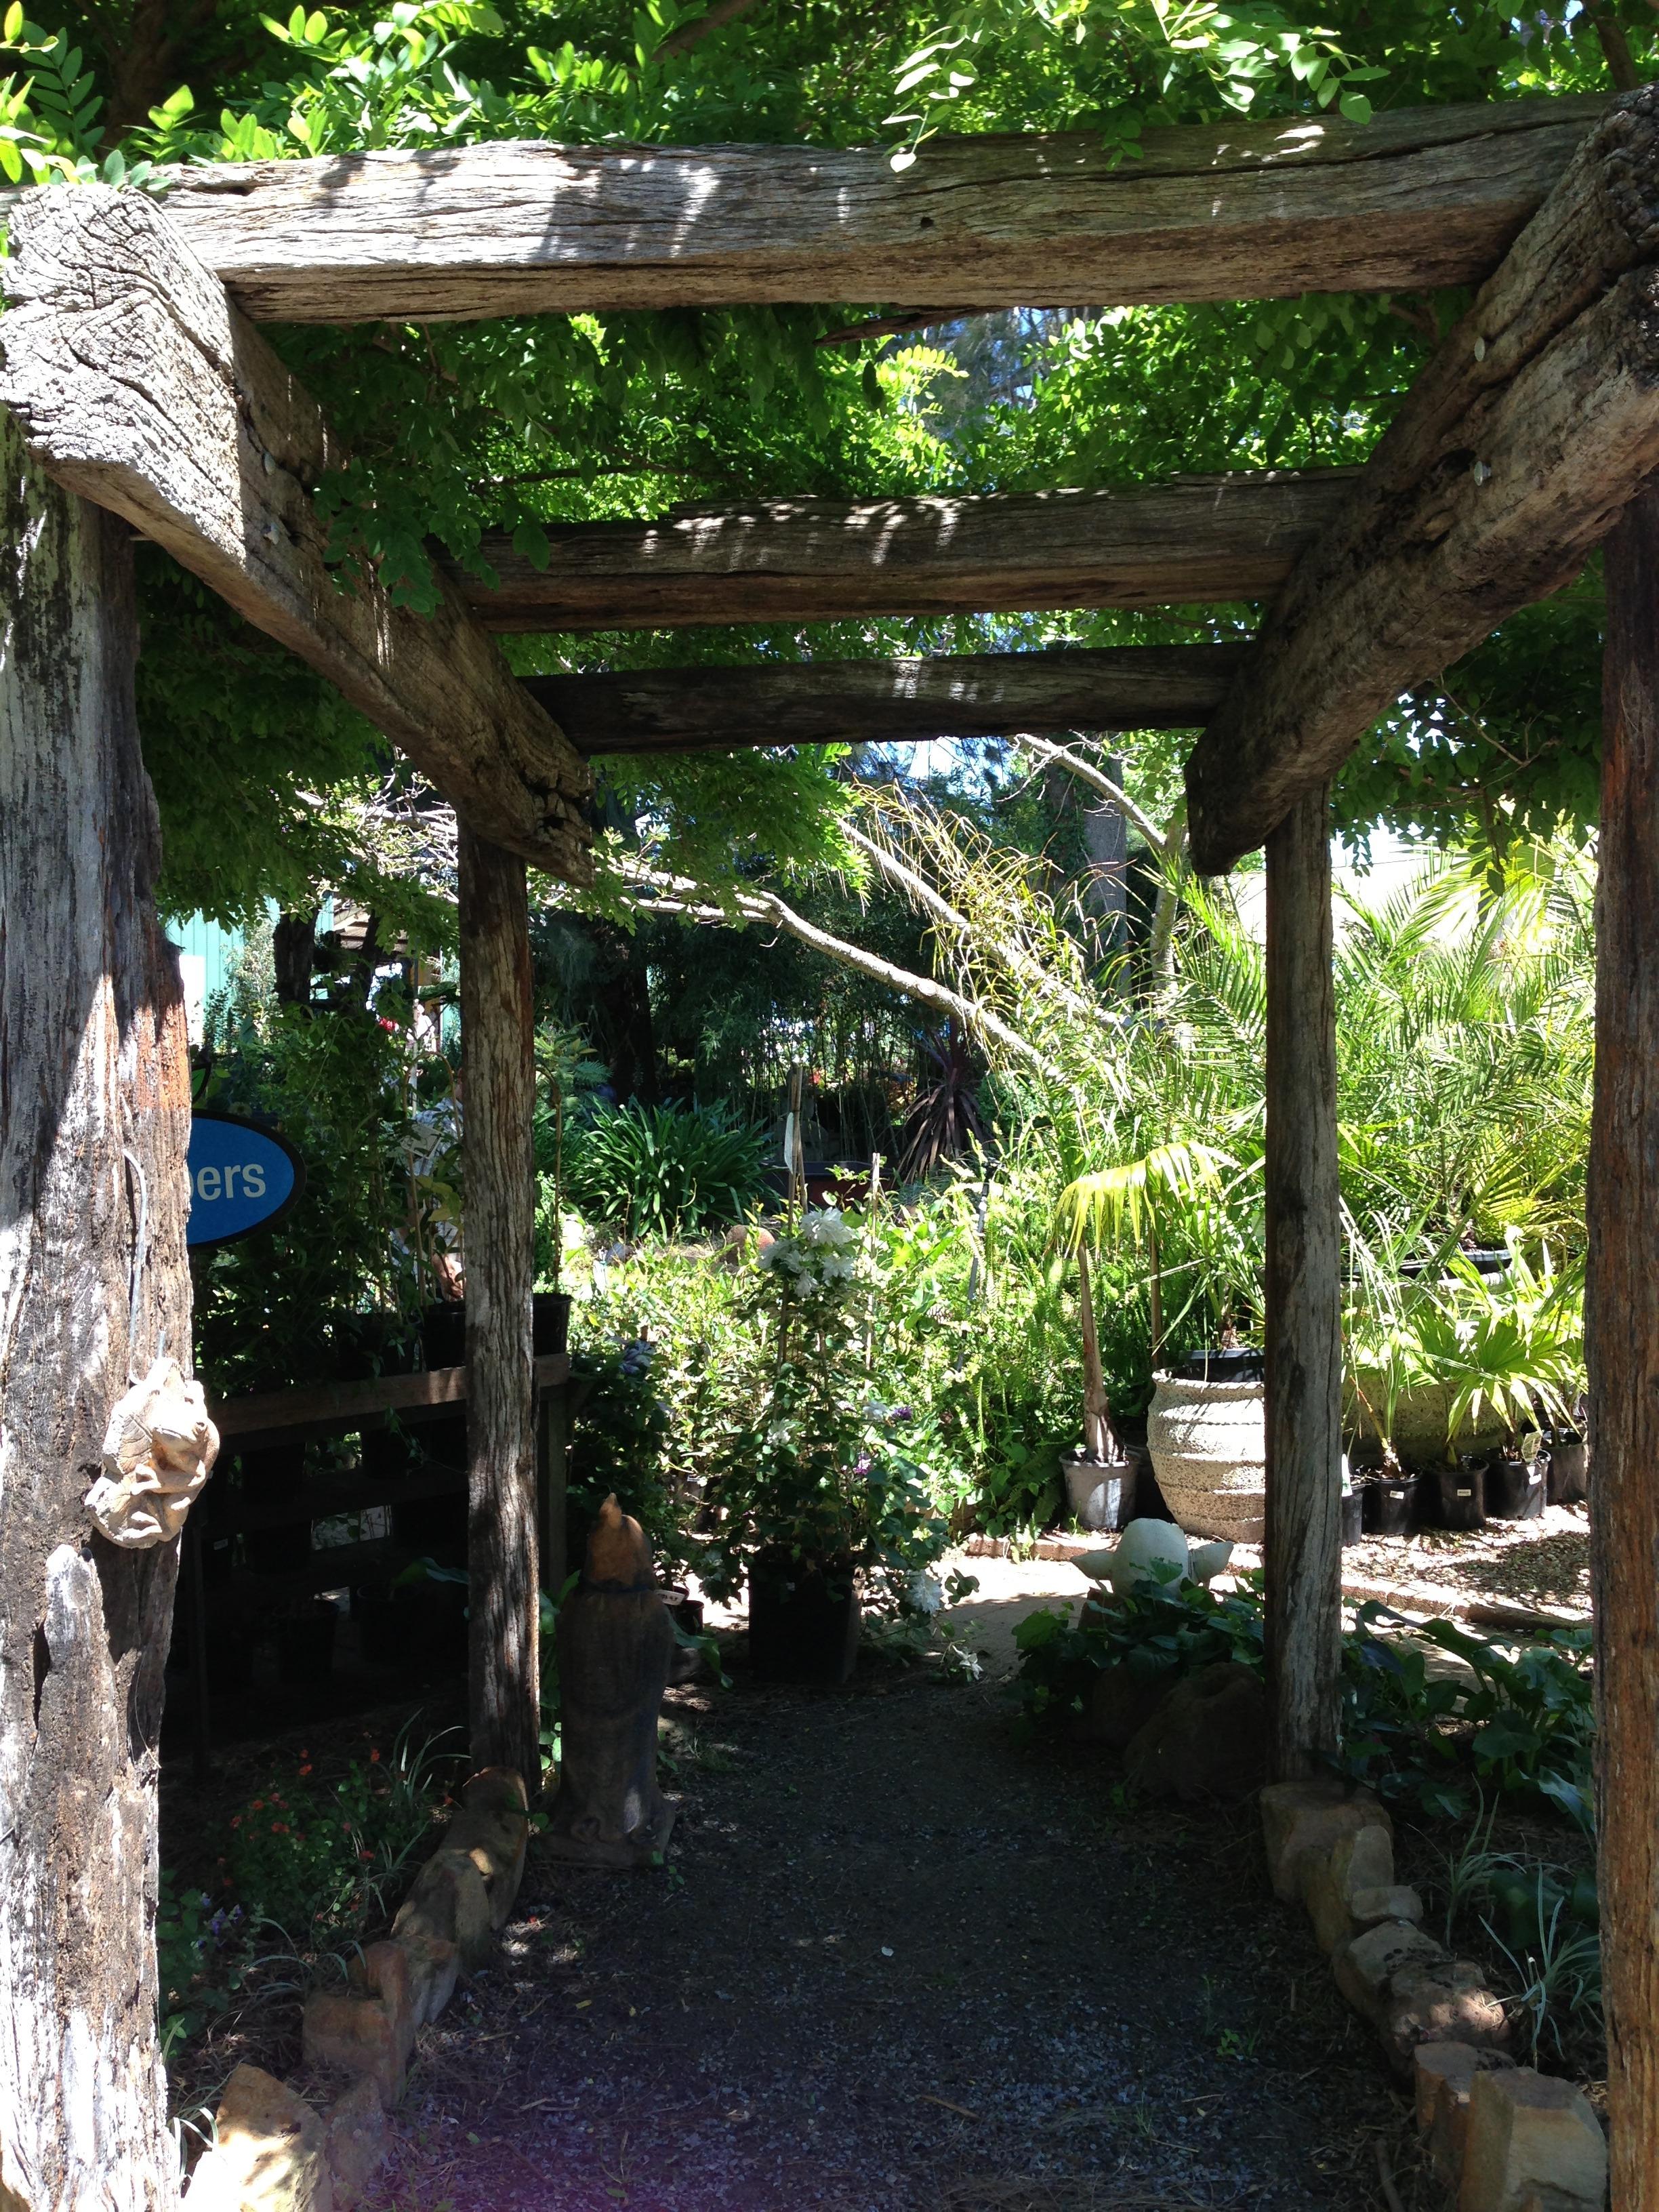 free images tree architecture plant flower jungle cottage